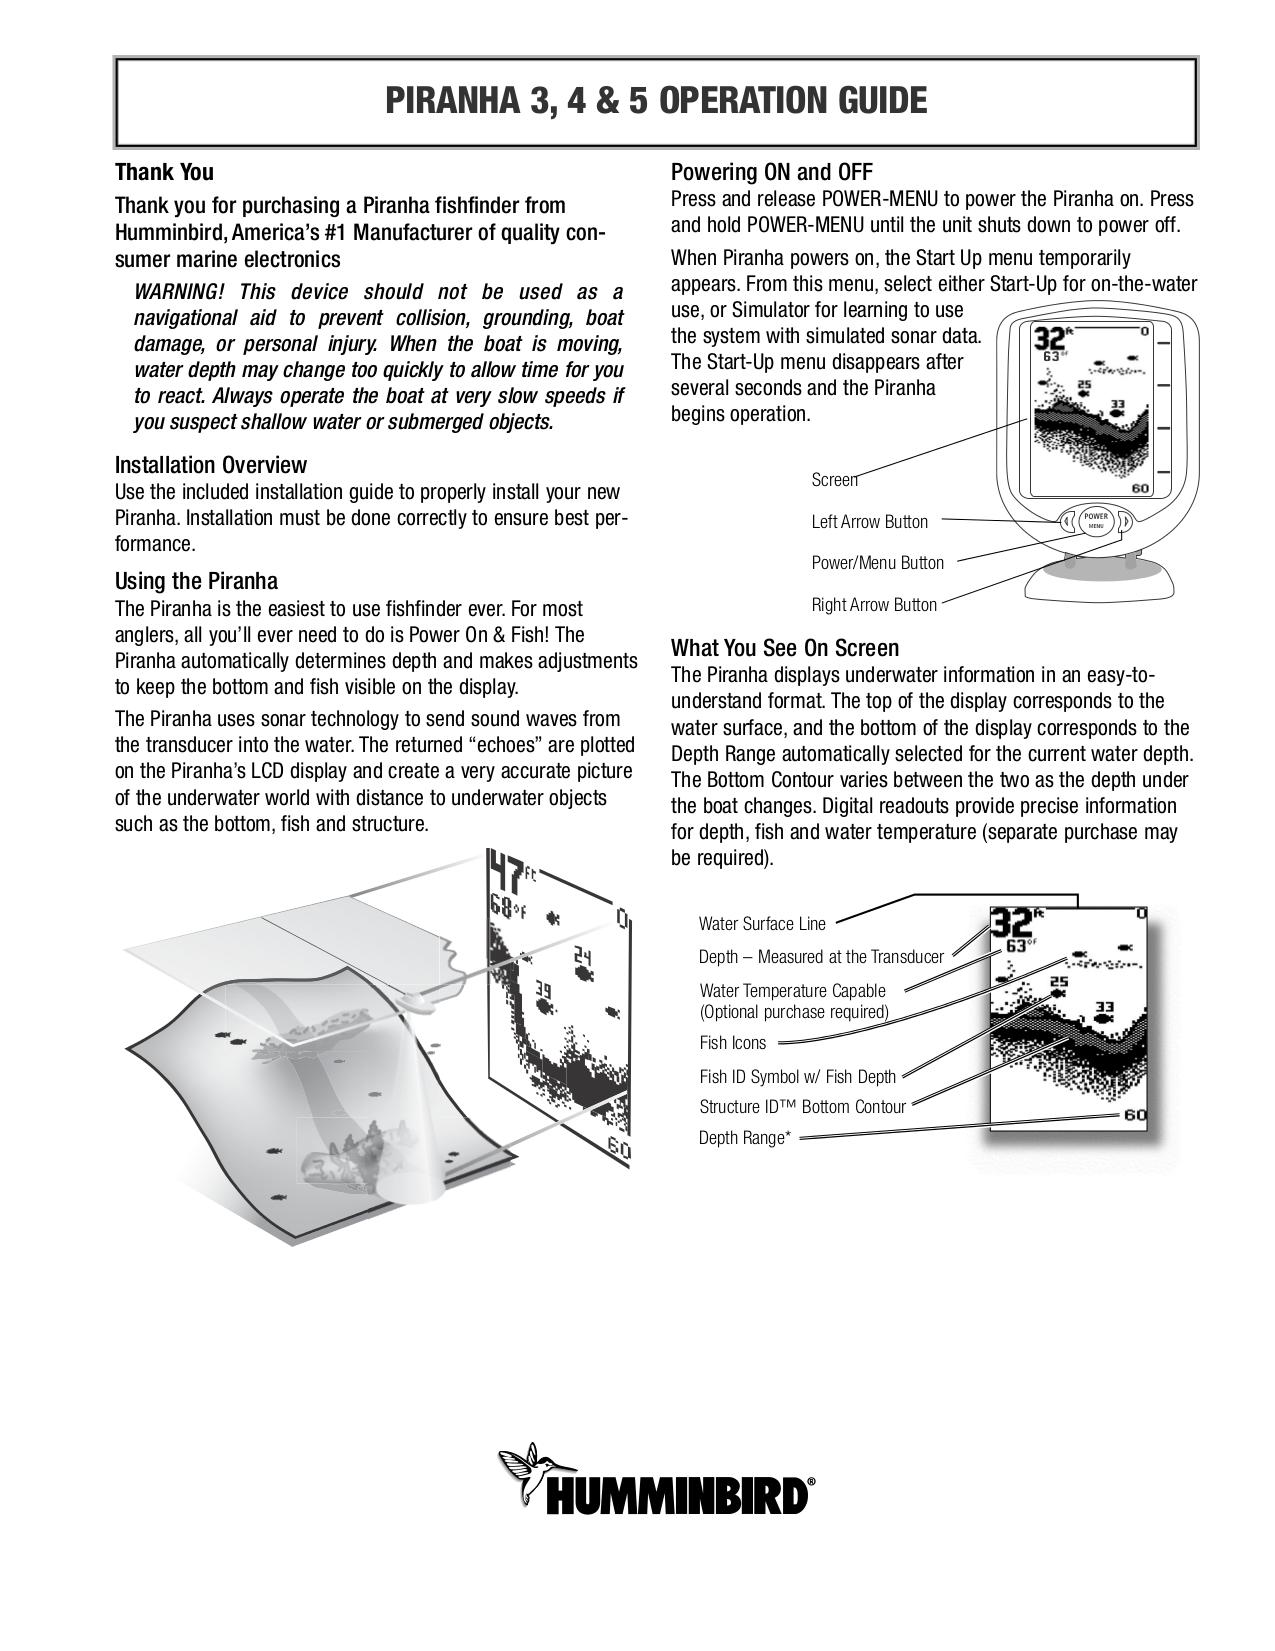 humminbird piranha 5x инструкция